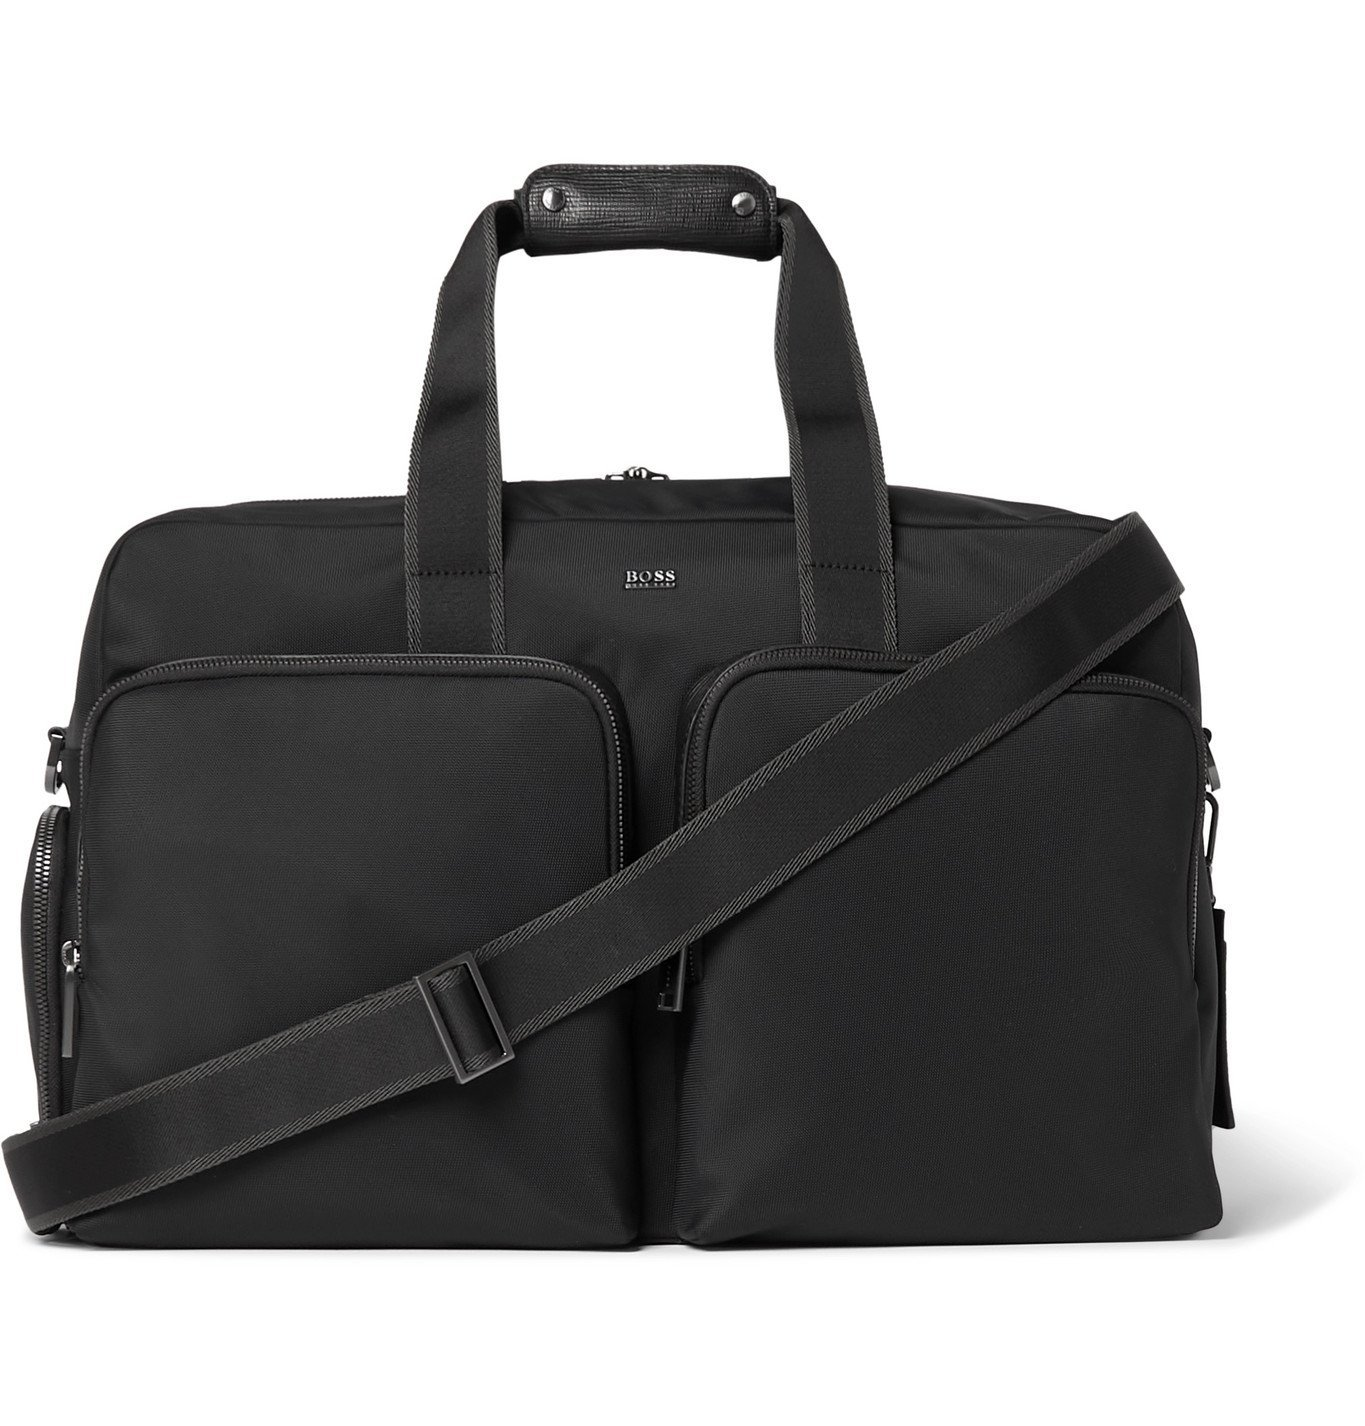 HUGO BOSS - Textured Leather-Trimmed Shell Holdall - Black